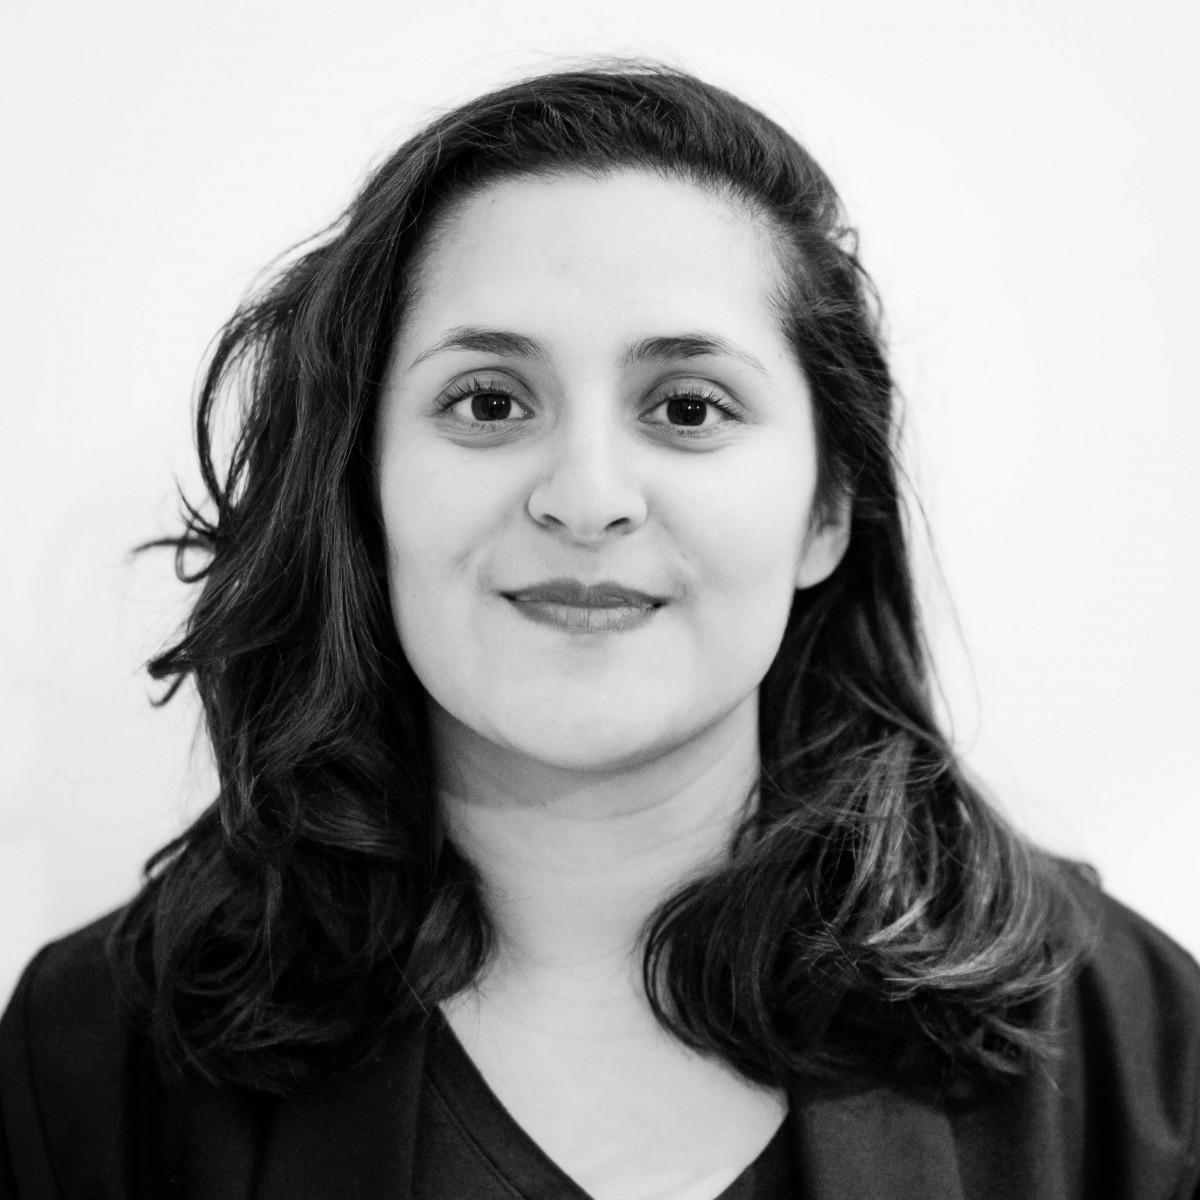 Tara Varma profile picture